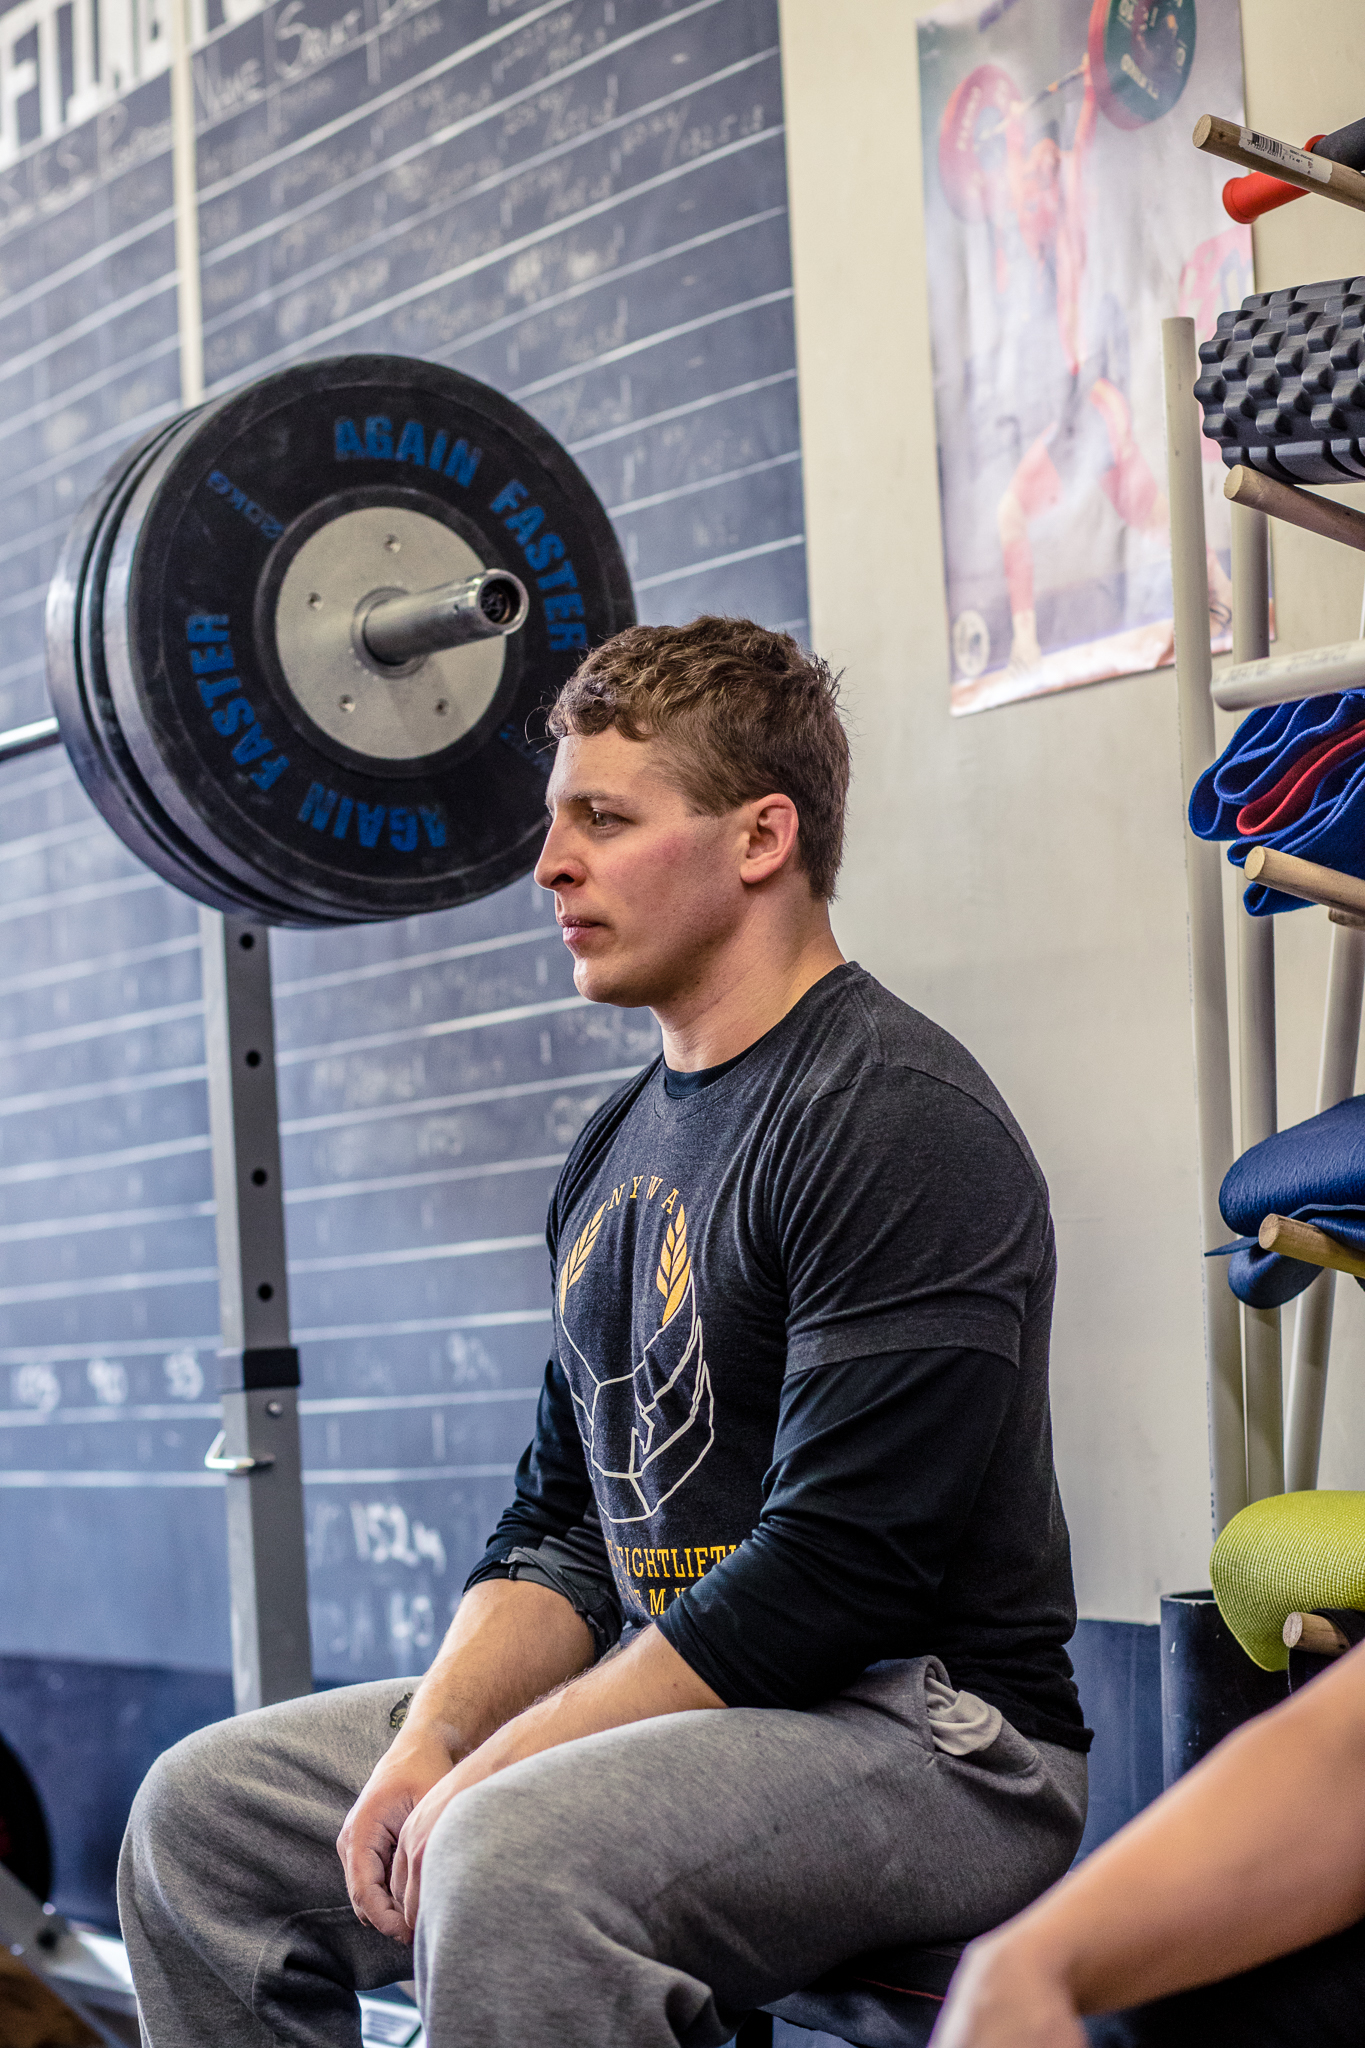 dan-casey-nywa-jdi-visit-weightlifting-coach-new-york-weightlifting-academy.jpg